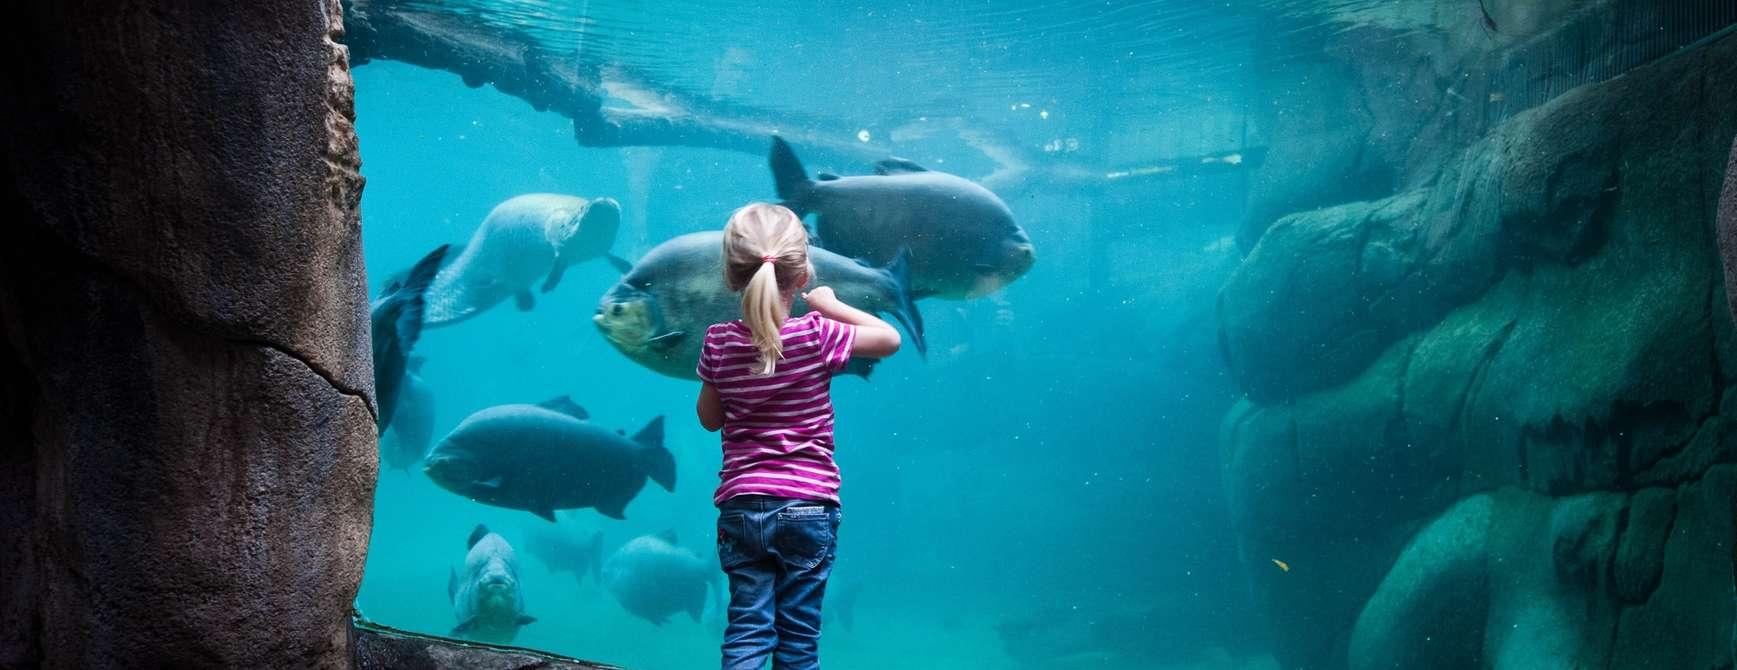 Jente som ser på tropiske fisk i akvarium i Randers Regnskov